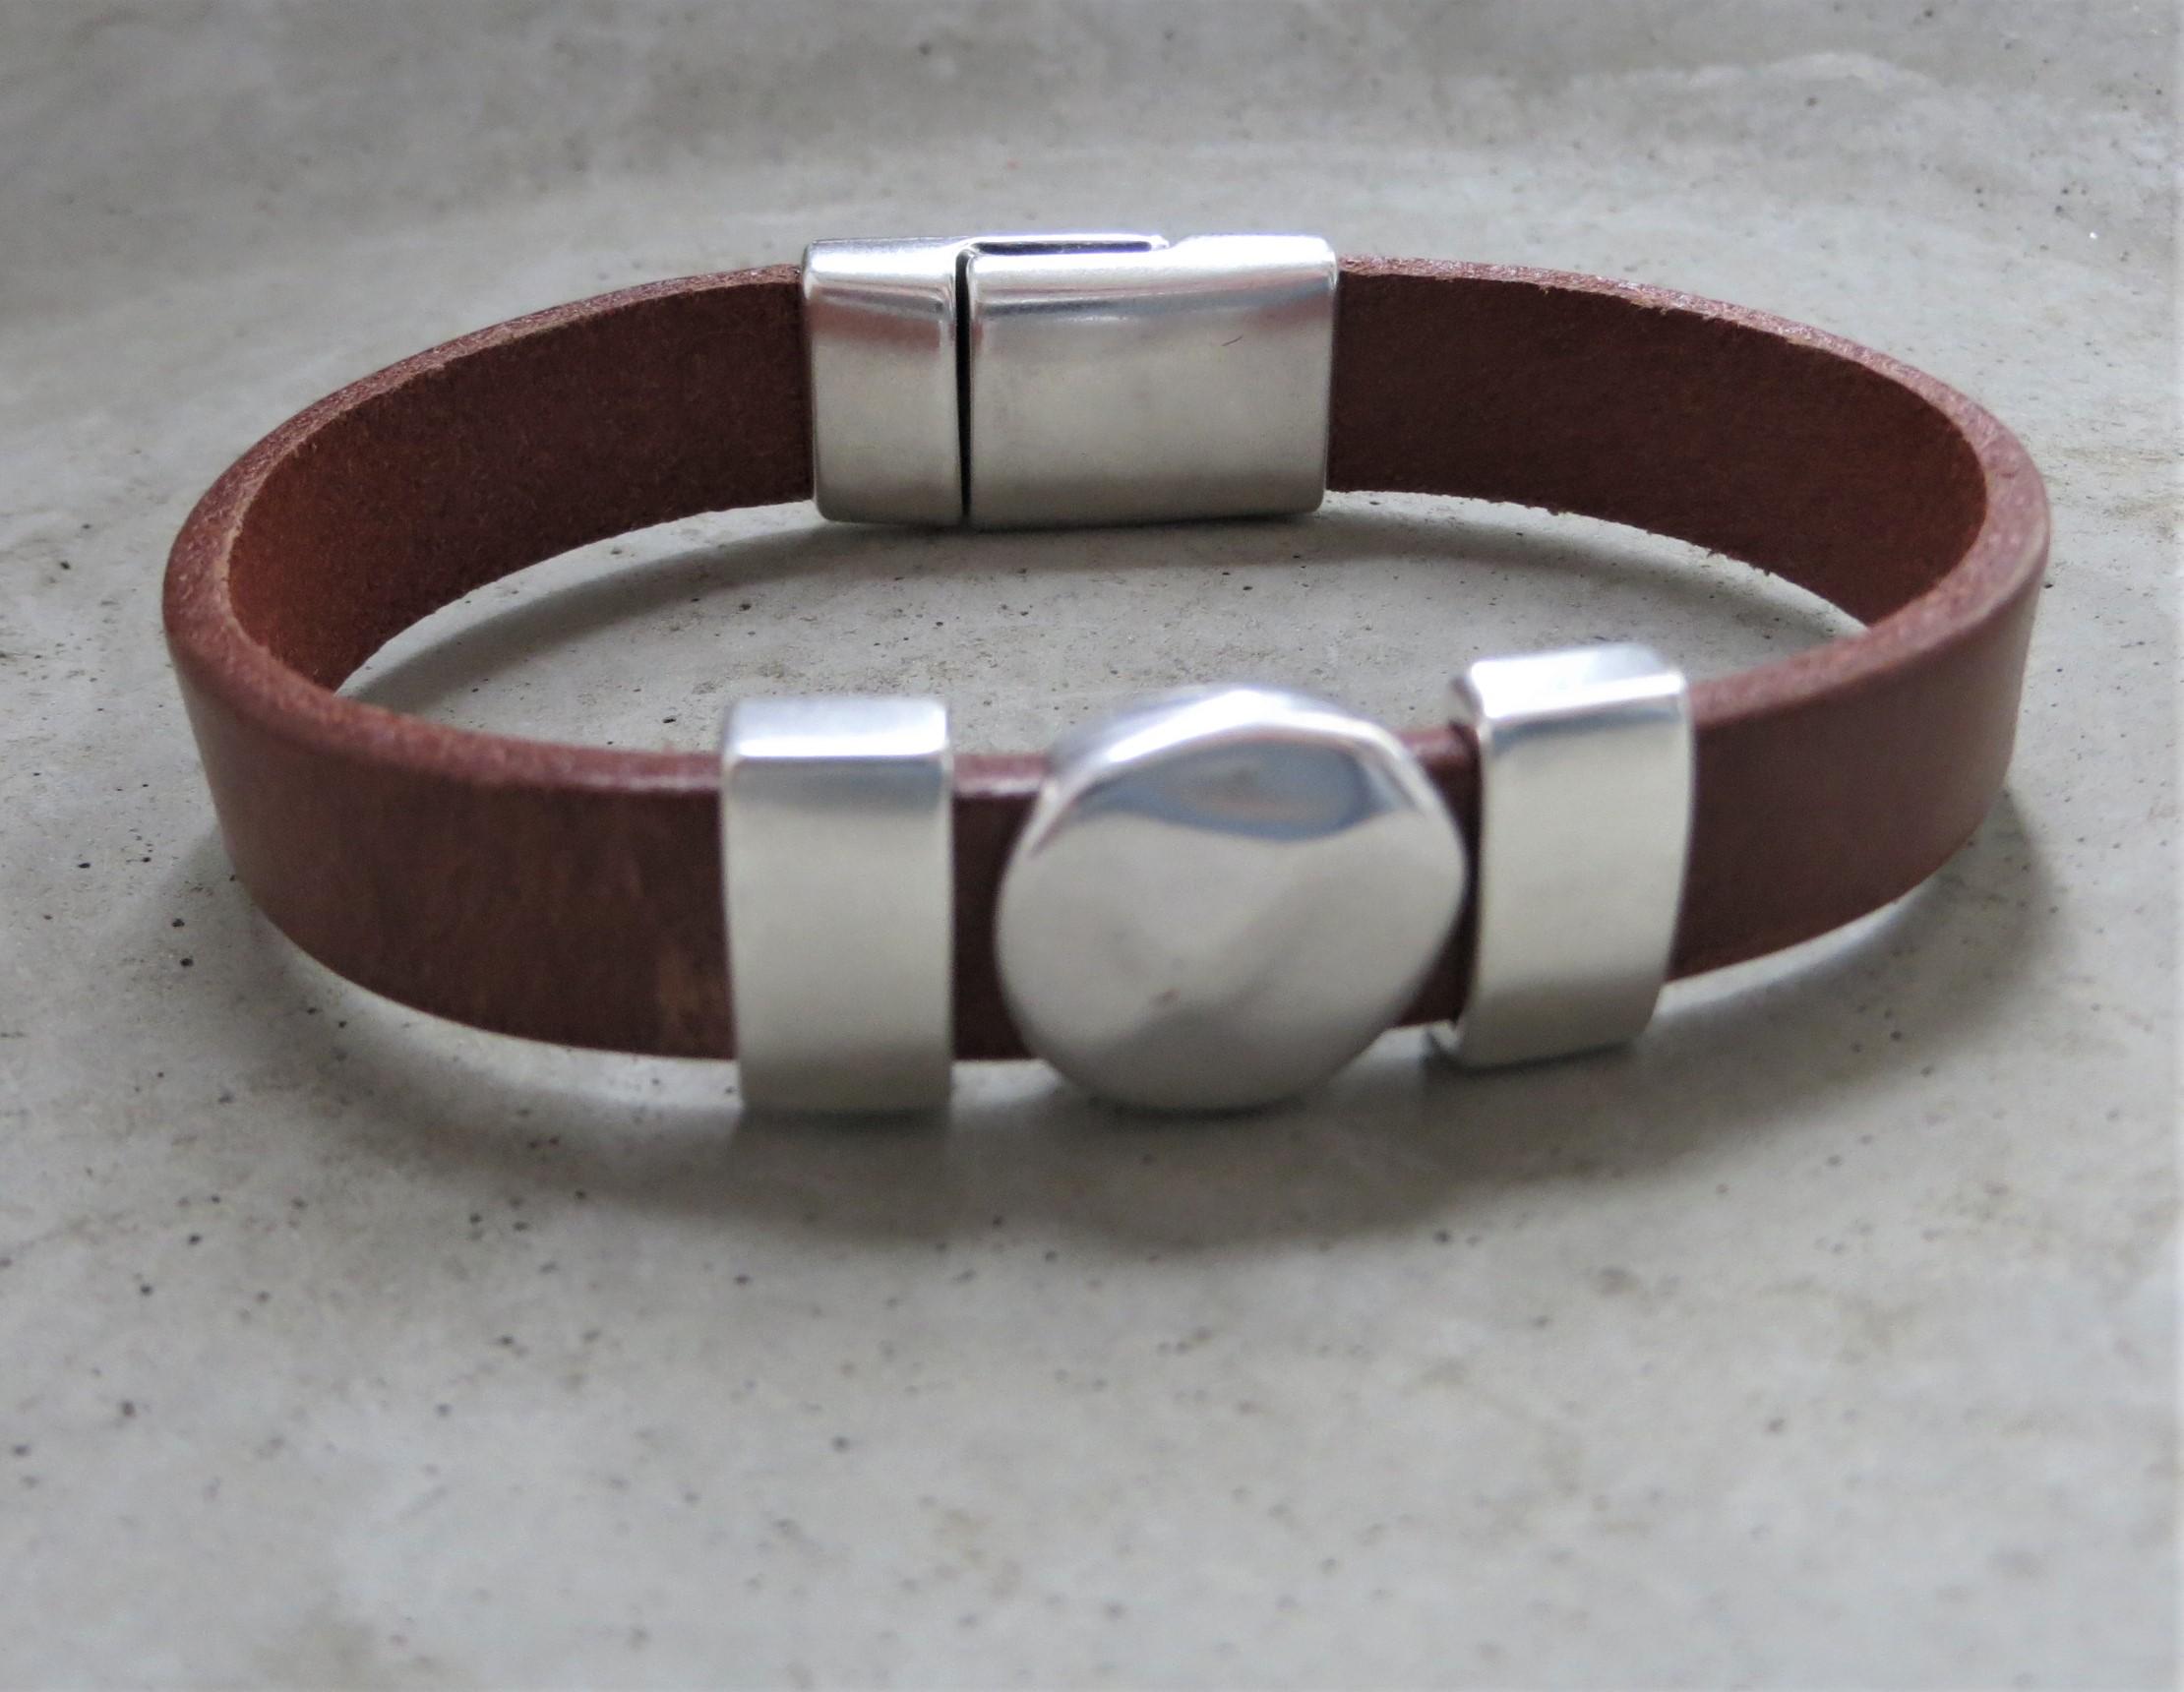 Armbaender - QOSS Armband KIM Braun Silber L  - Onlineshop Tante Emmer